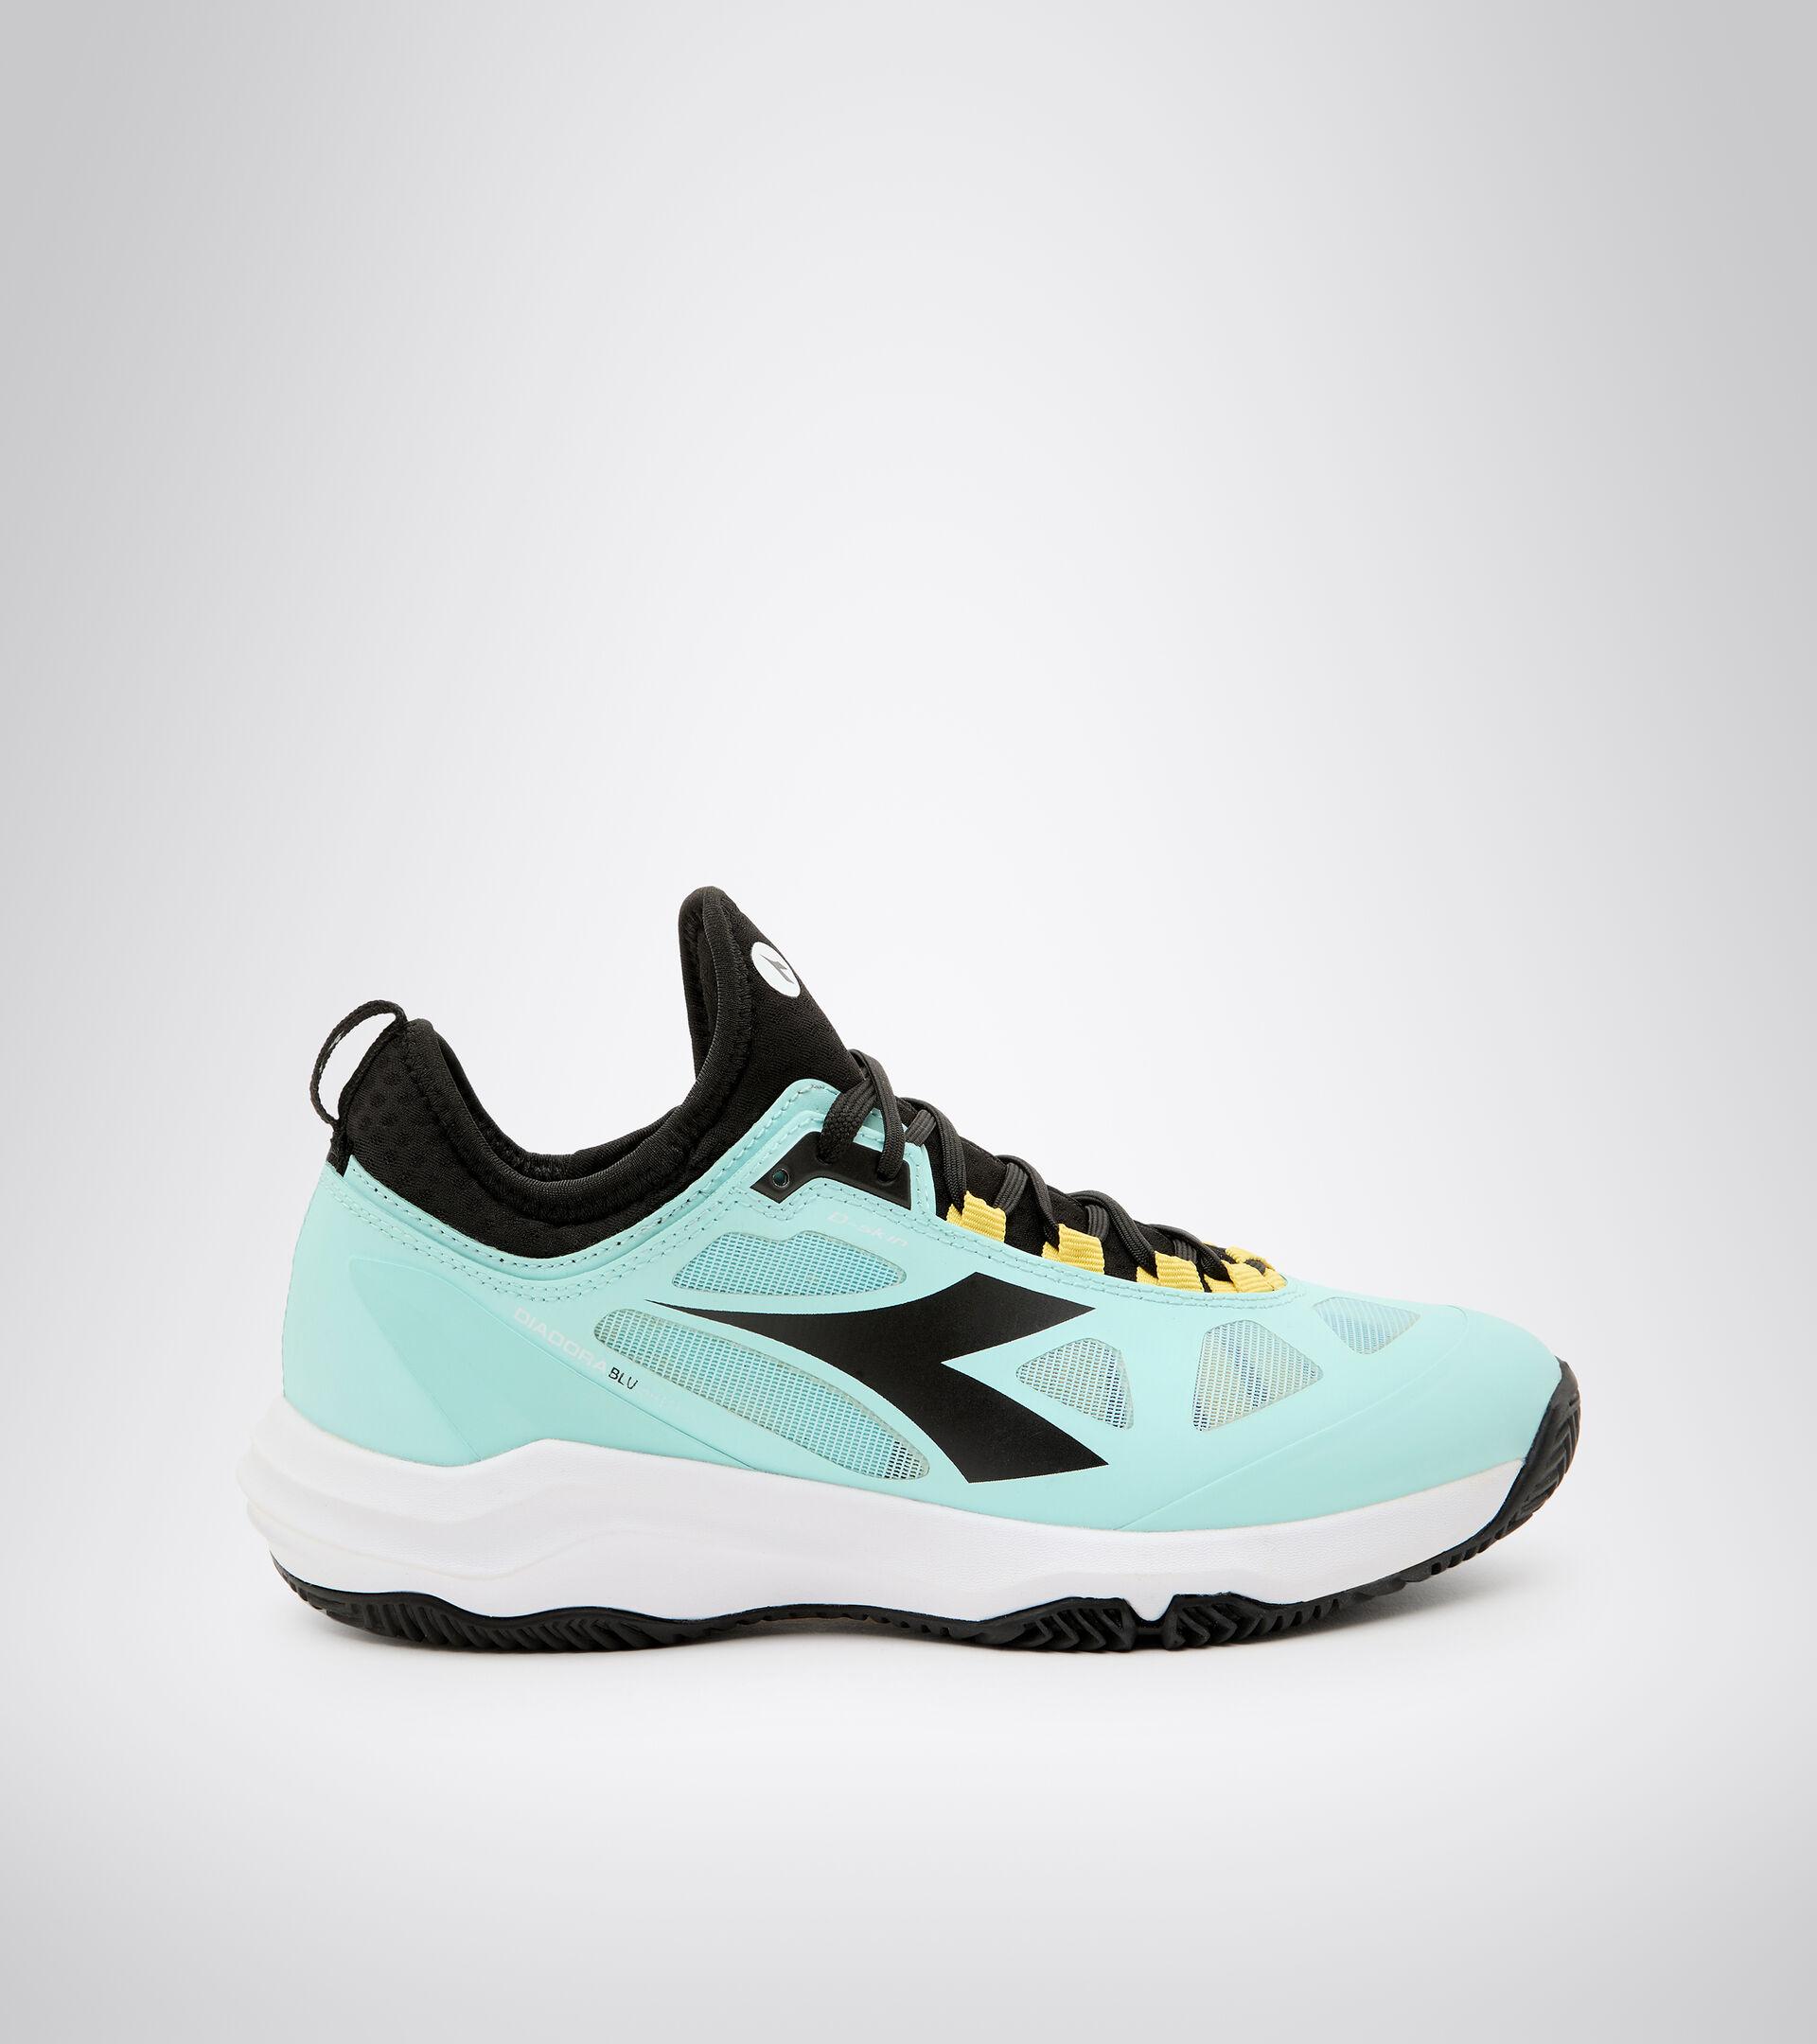 Footwear Sport DONNA SPEED BLUSHIELD FLY 3 + W CLAY BLUE TINT/BLACK/WHITE Diadora